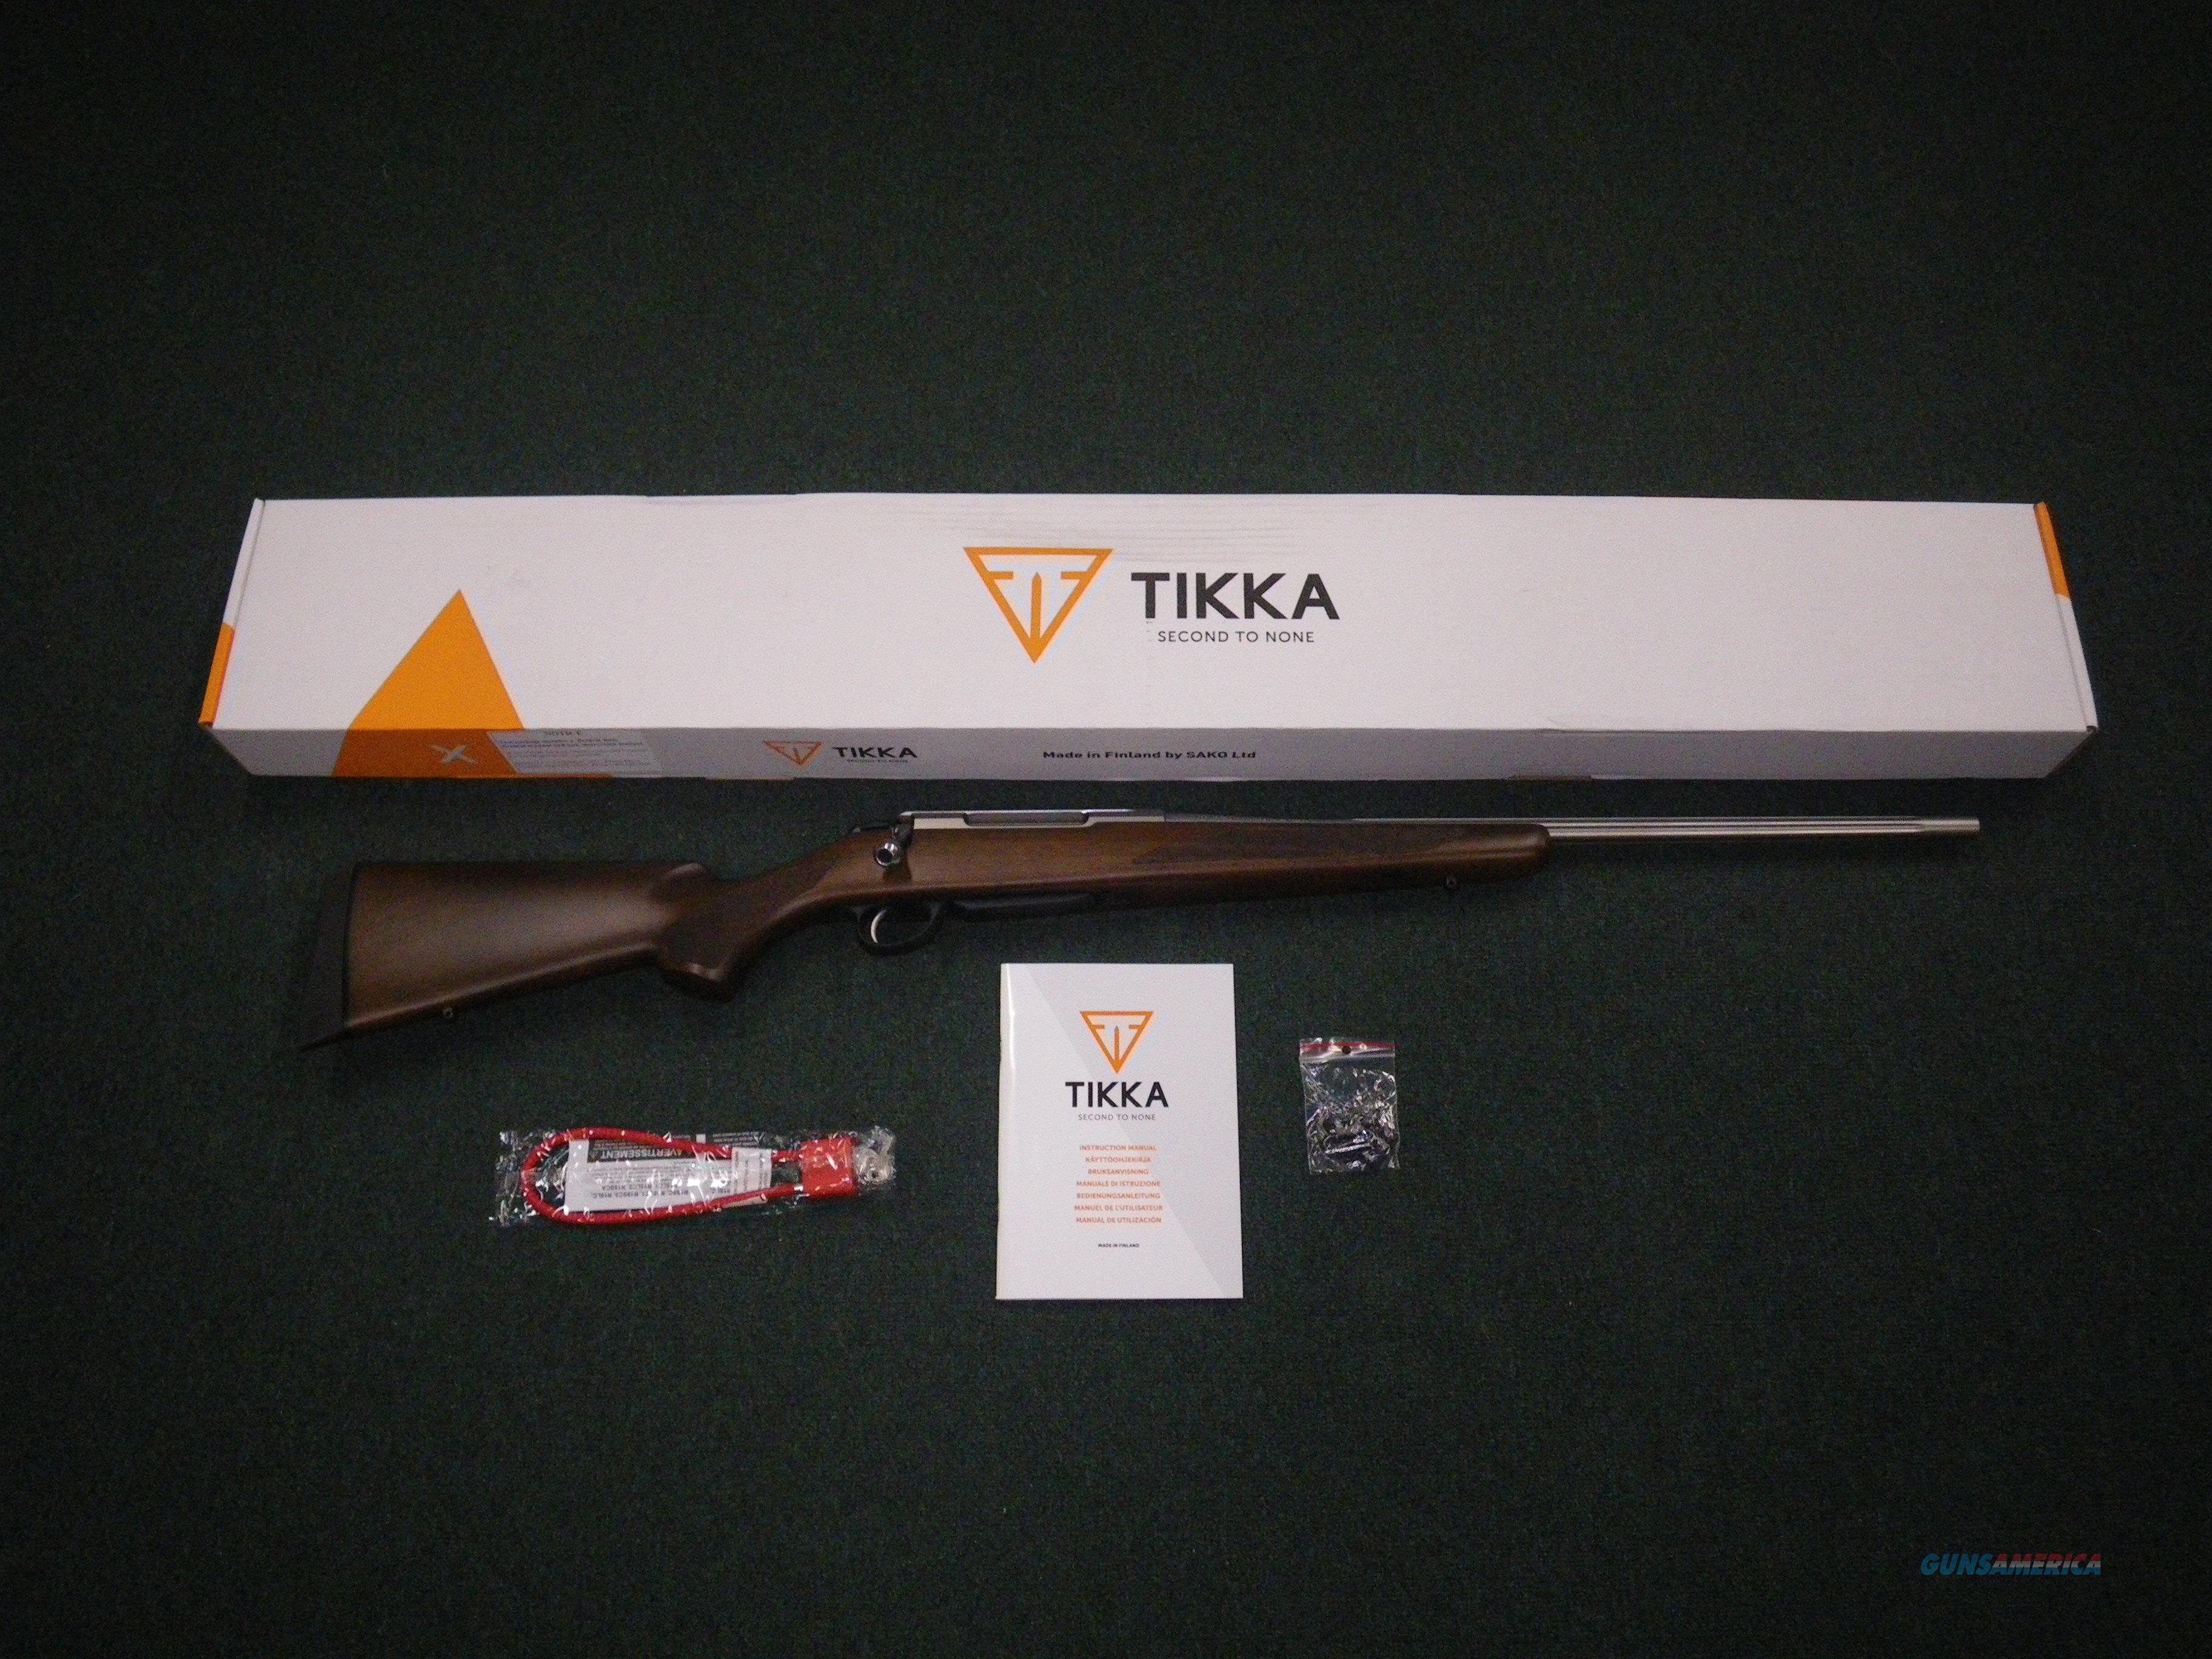 "Tikka T3x Hunter Stainless 270 Win 22.4"" NEW #JRTXA718  Guns > Rifles > Tikka Rifles > T3"